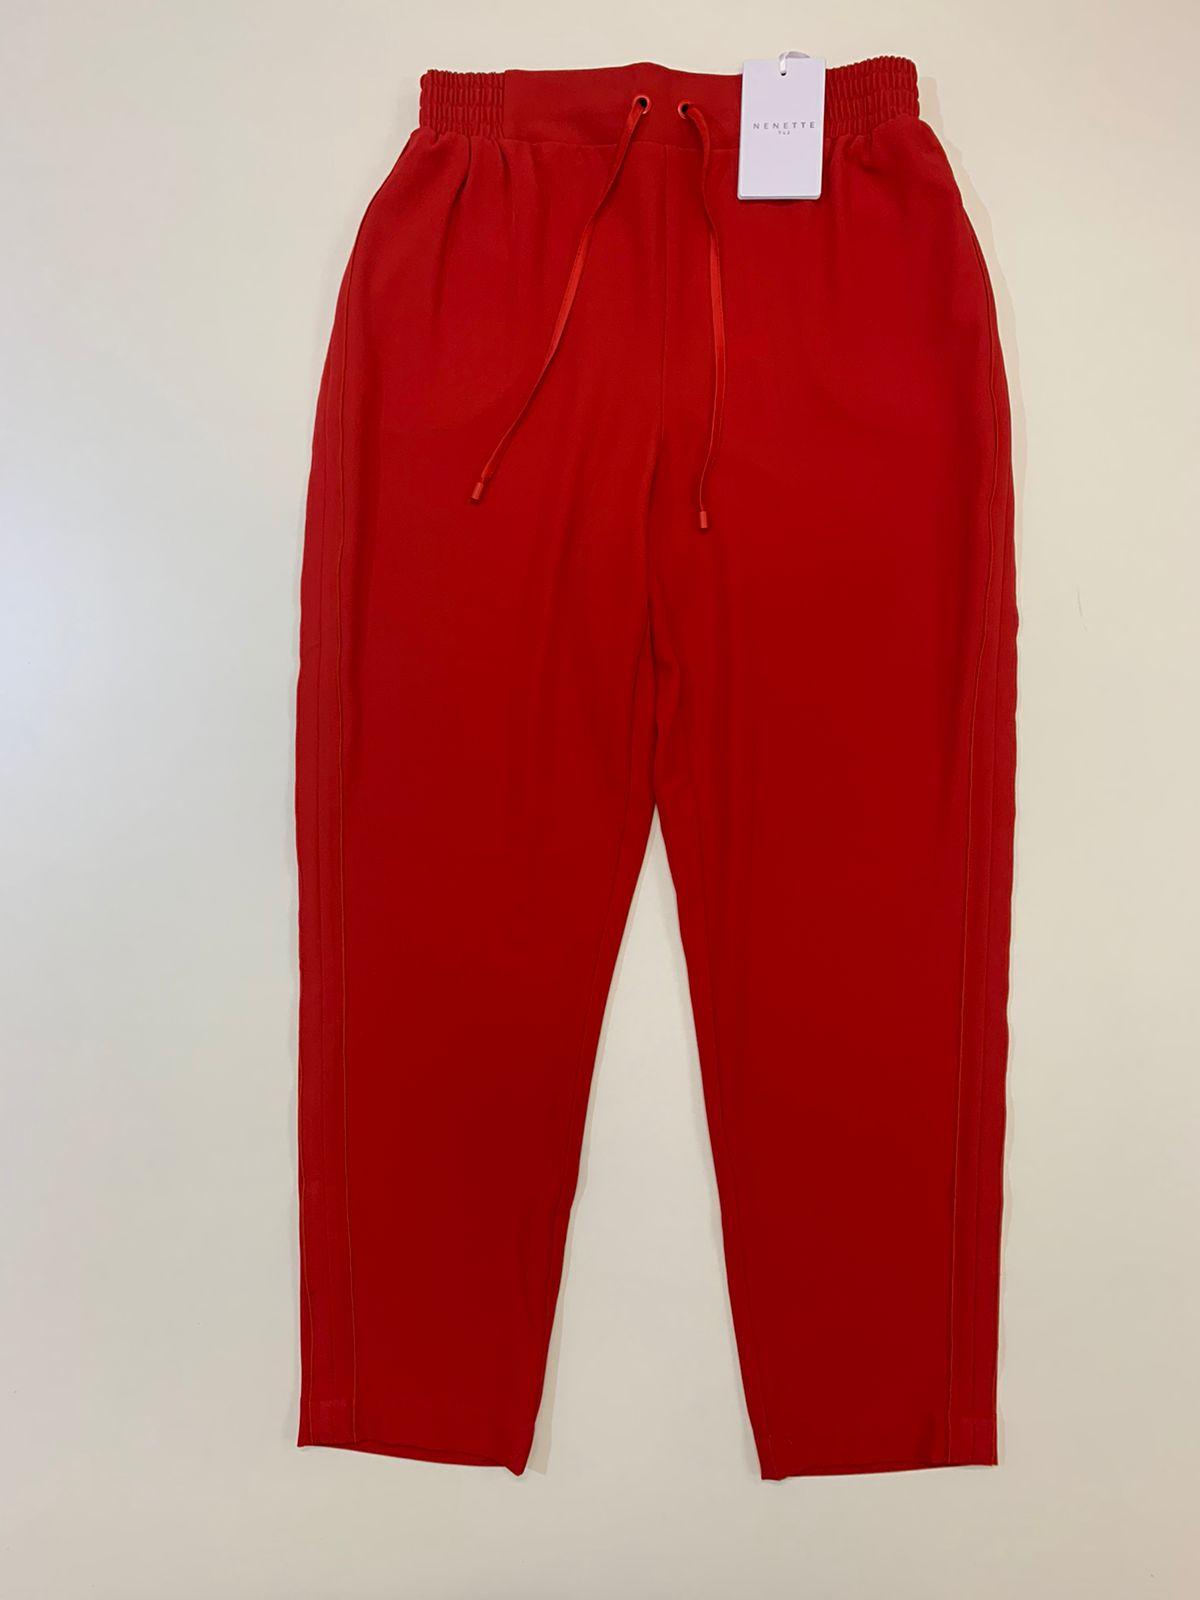 Pantalone Tous Les Jours Ebe Rosso